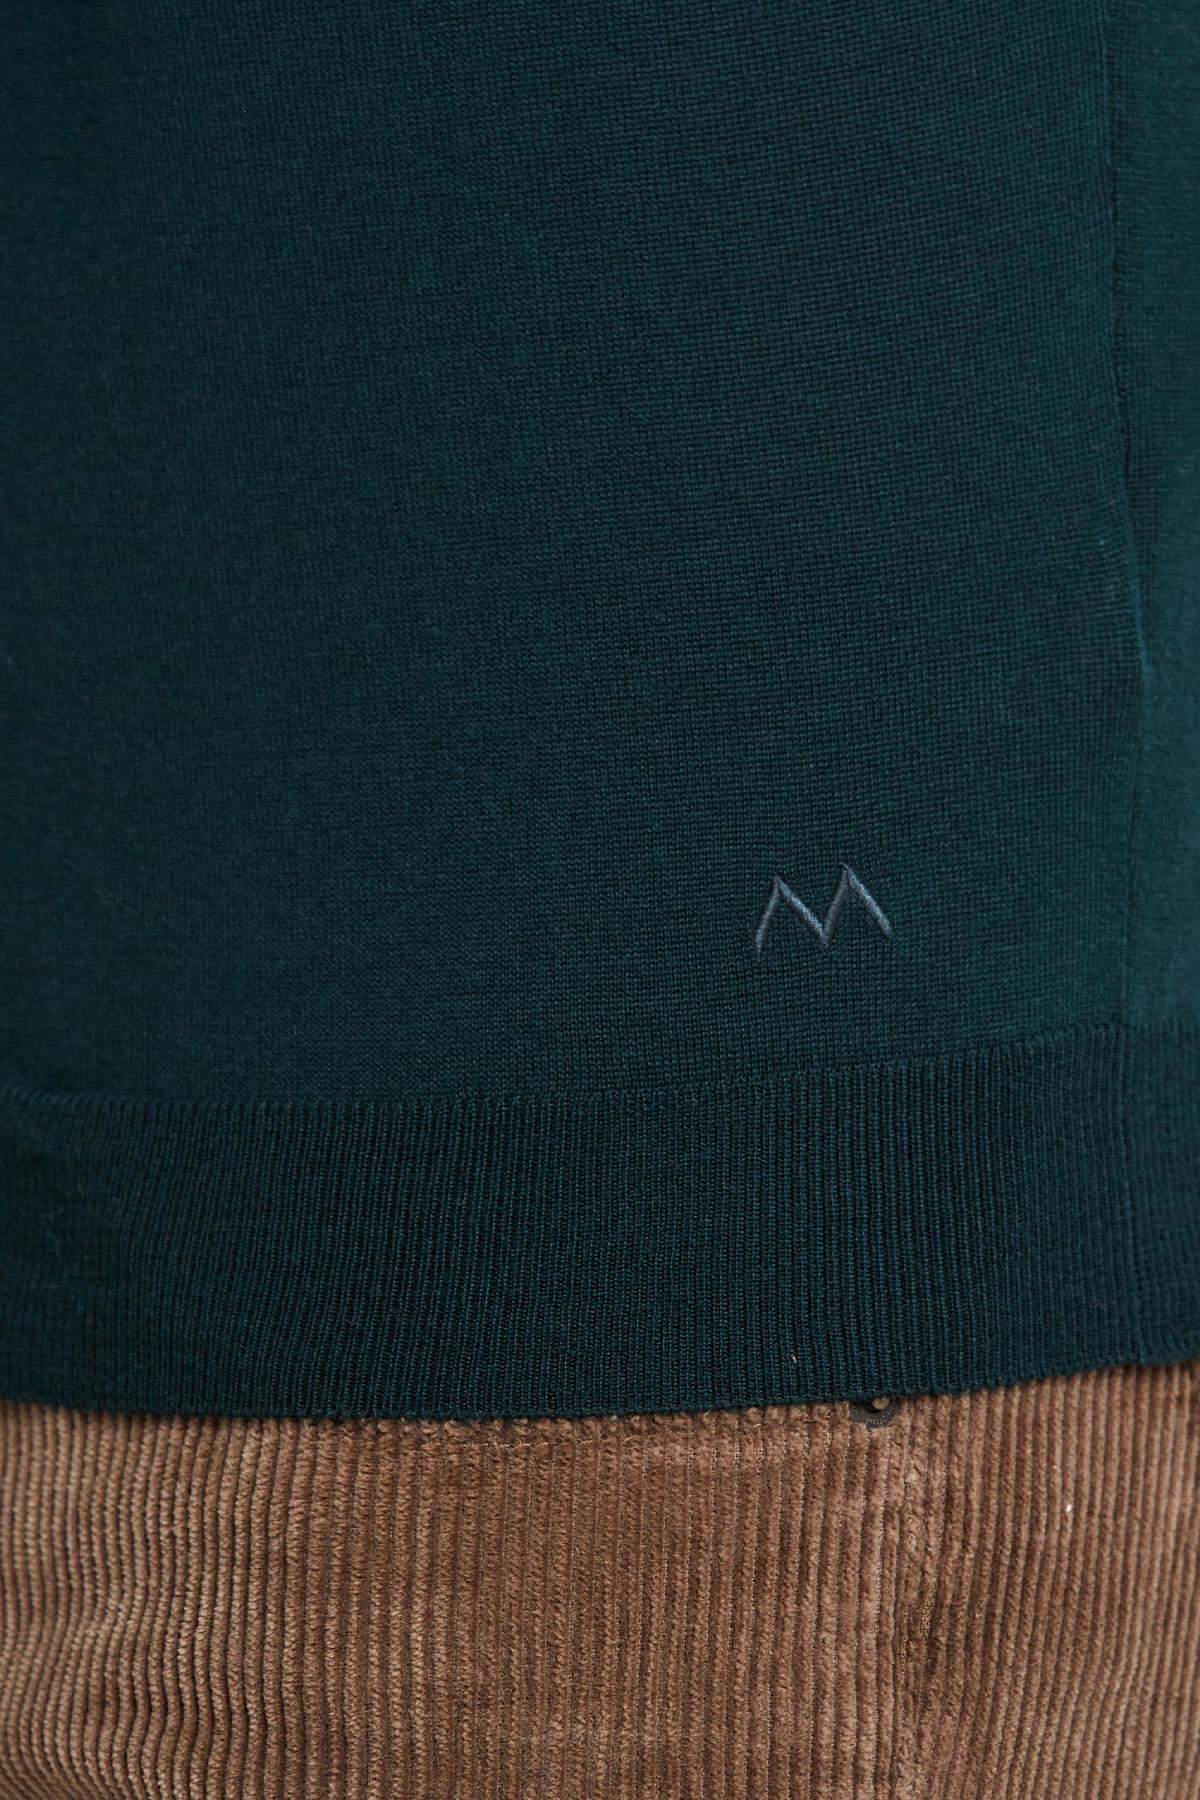 Polo Yaka Koyu Yeşil Merino Yün Triko